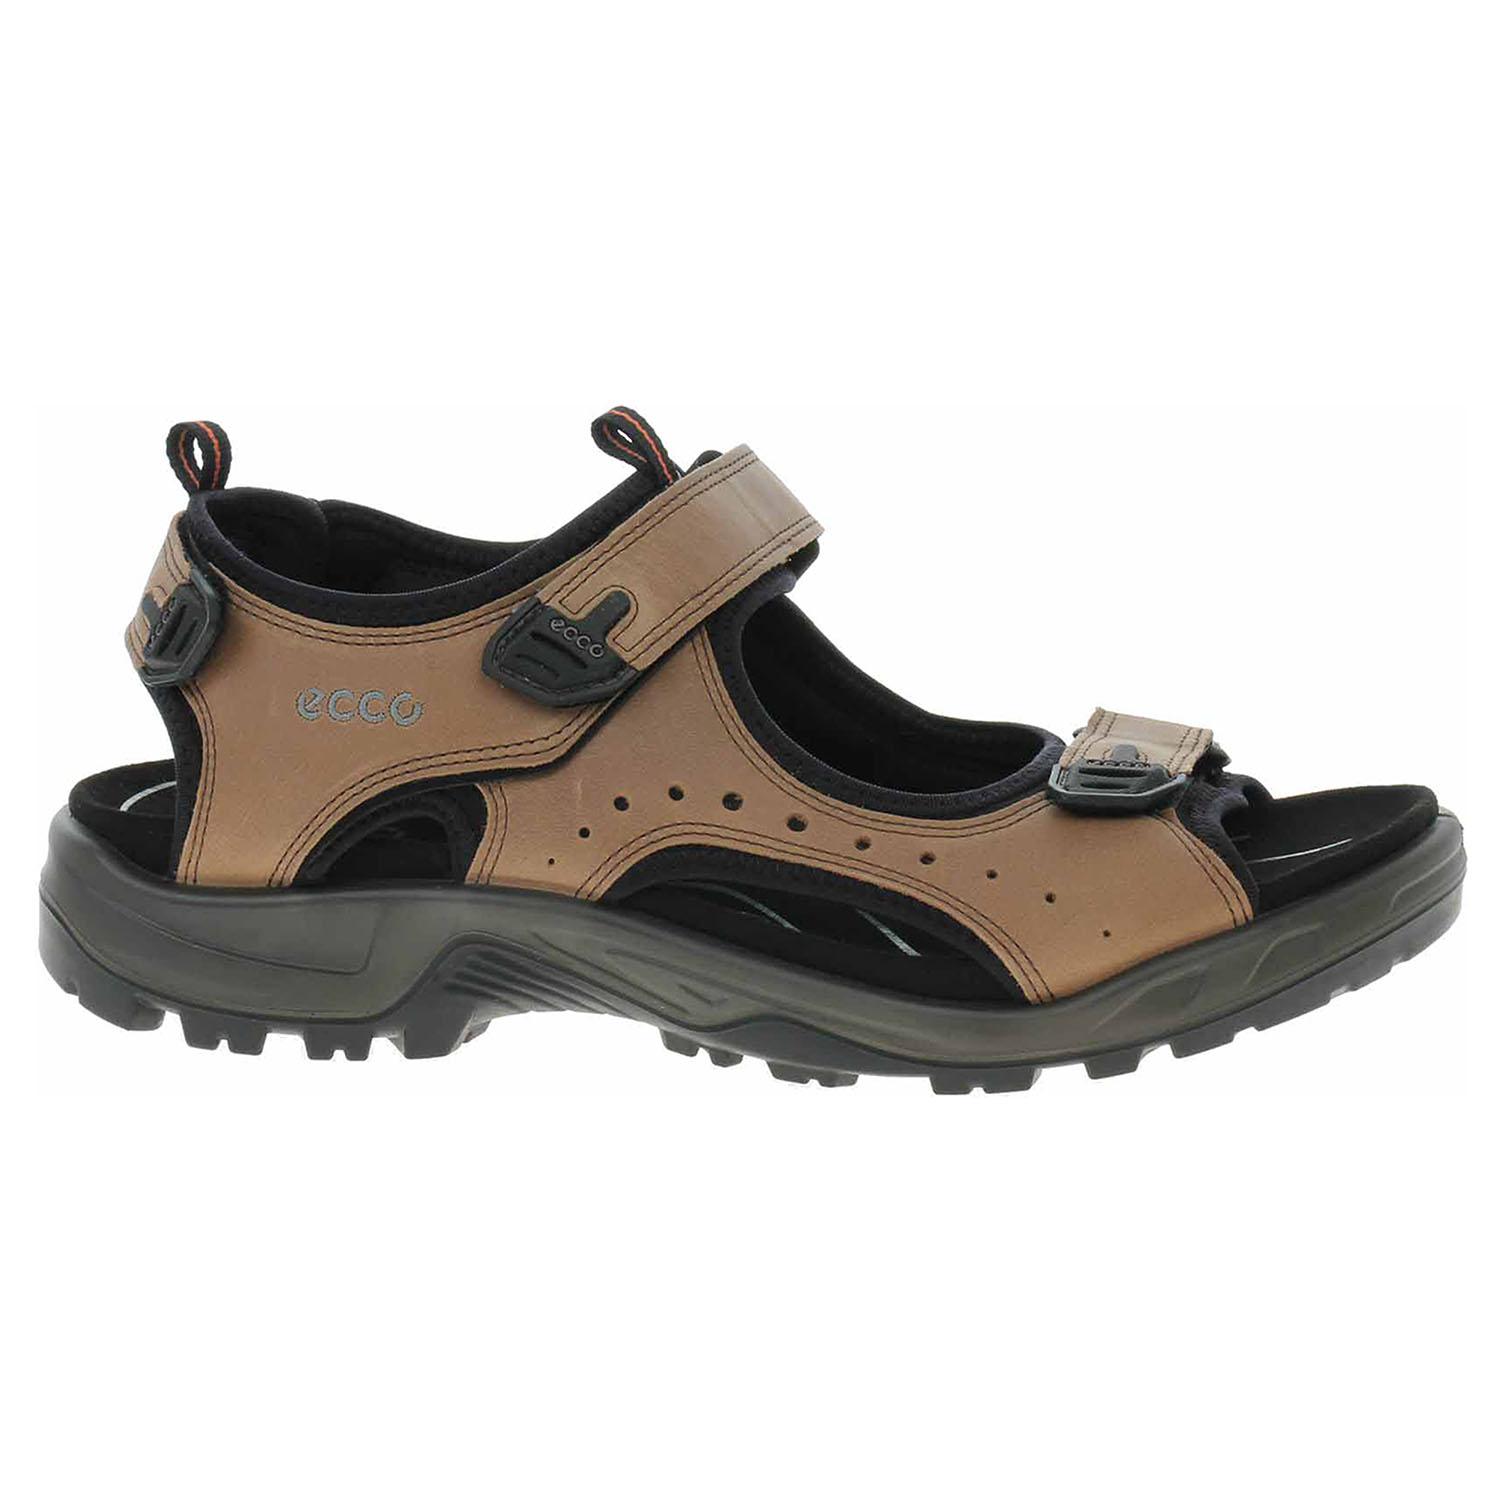 0f762fe57 Ecco Pánské sandály Ecco Offroad 82204402114 navajo brown 24700287